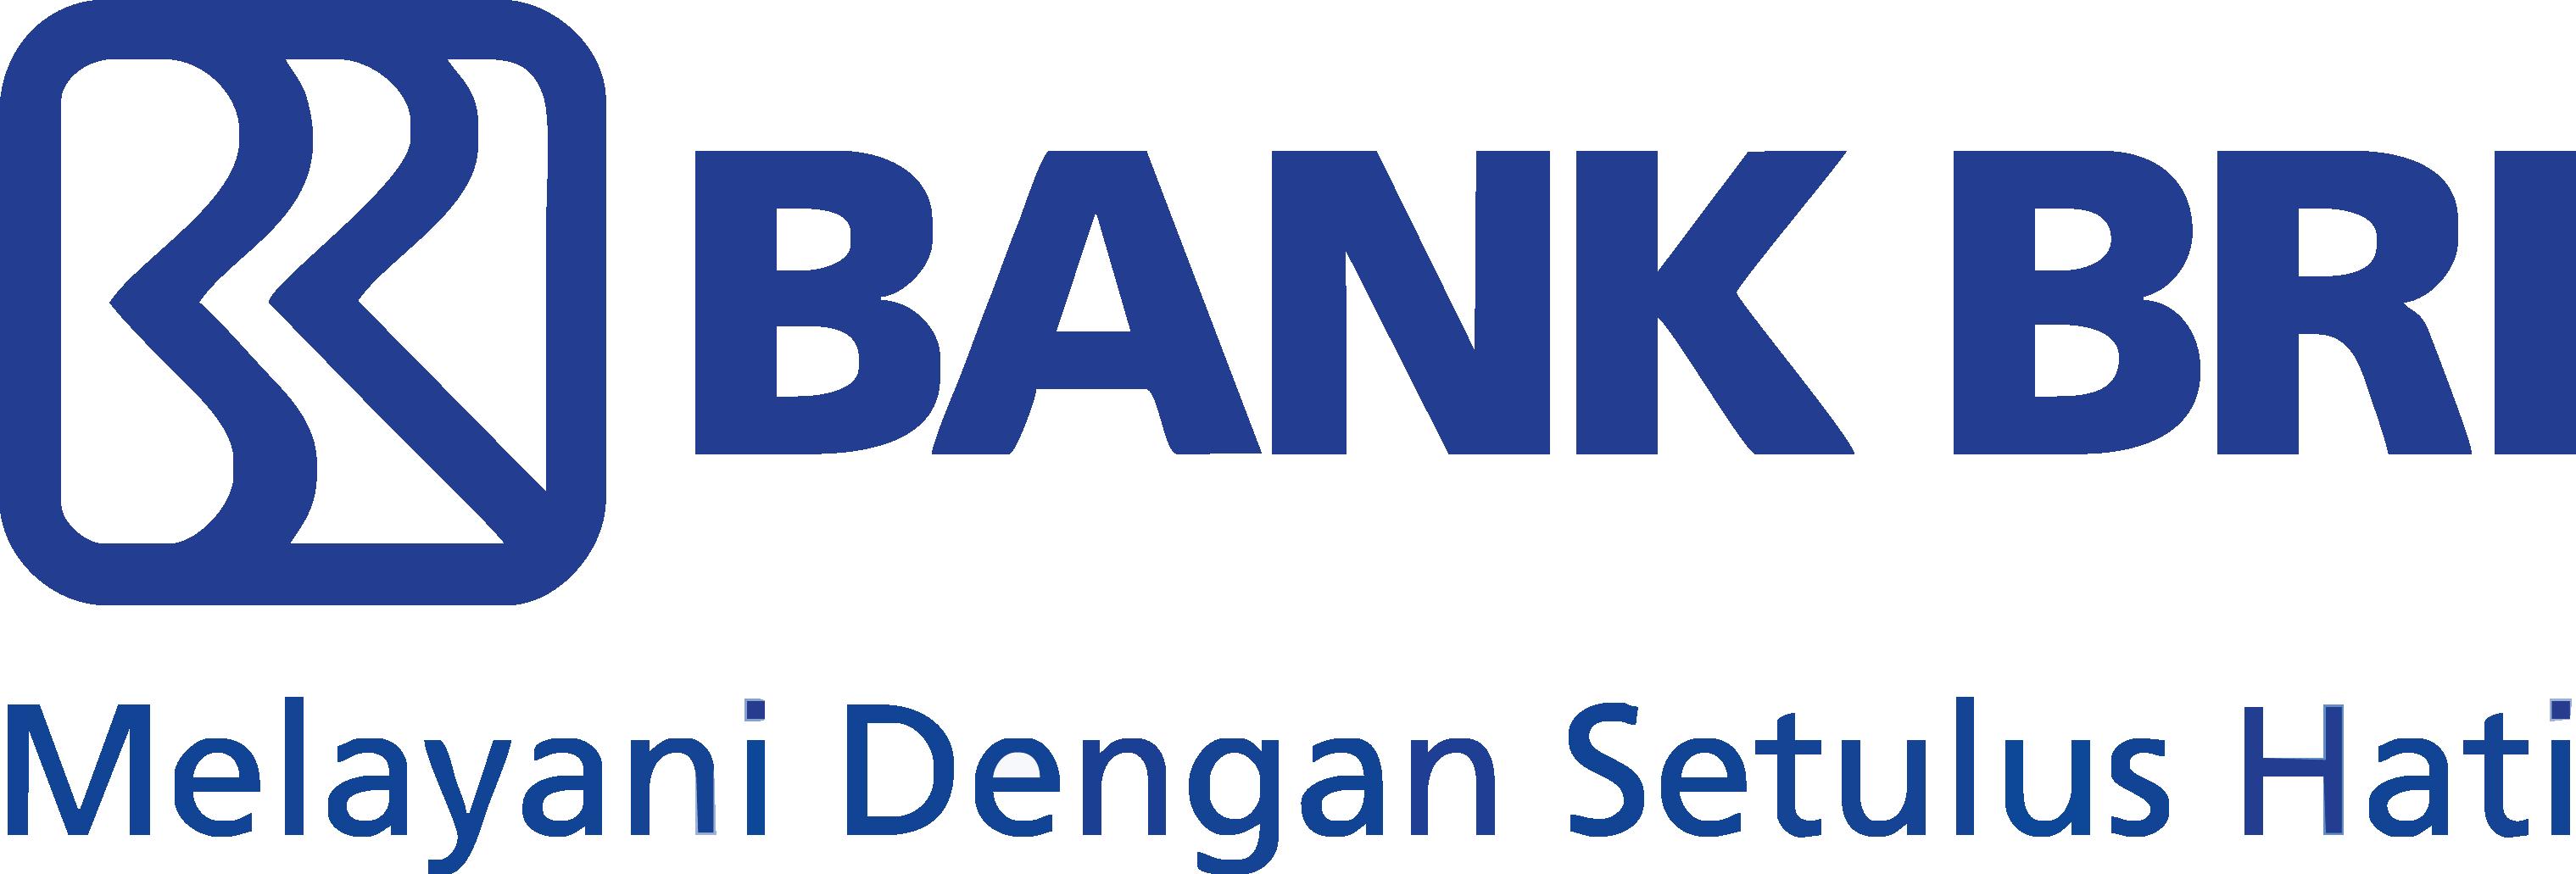 bank-bri-logo